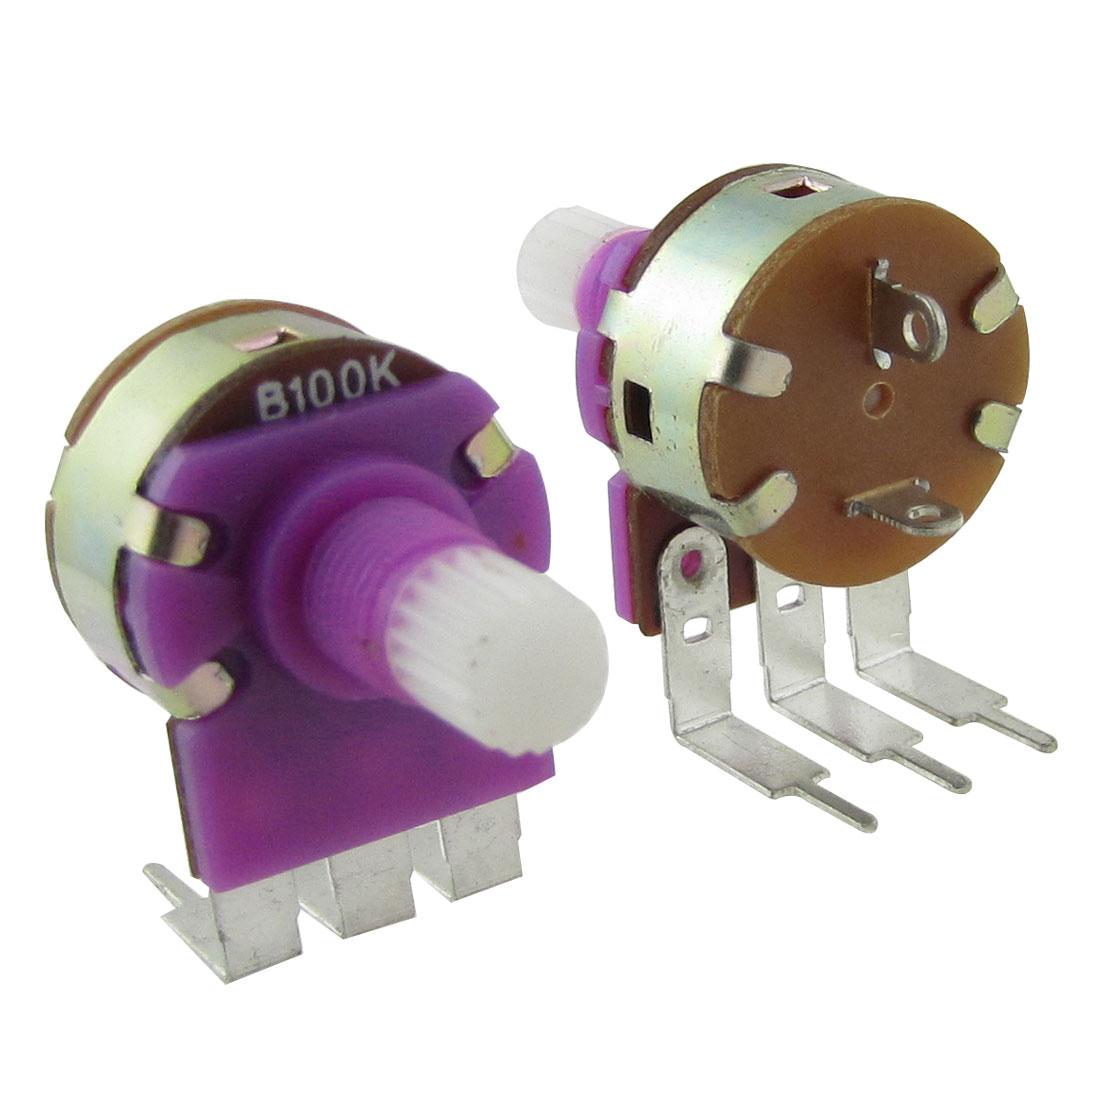 2 Pcs 0.2W 100Kohm Audio Carbon Film Potentiometer with Switch